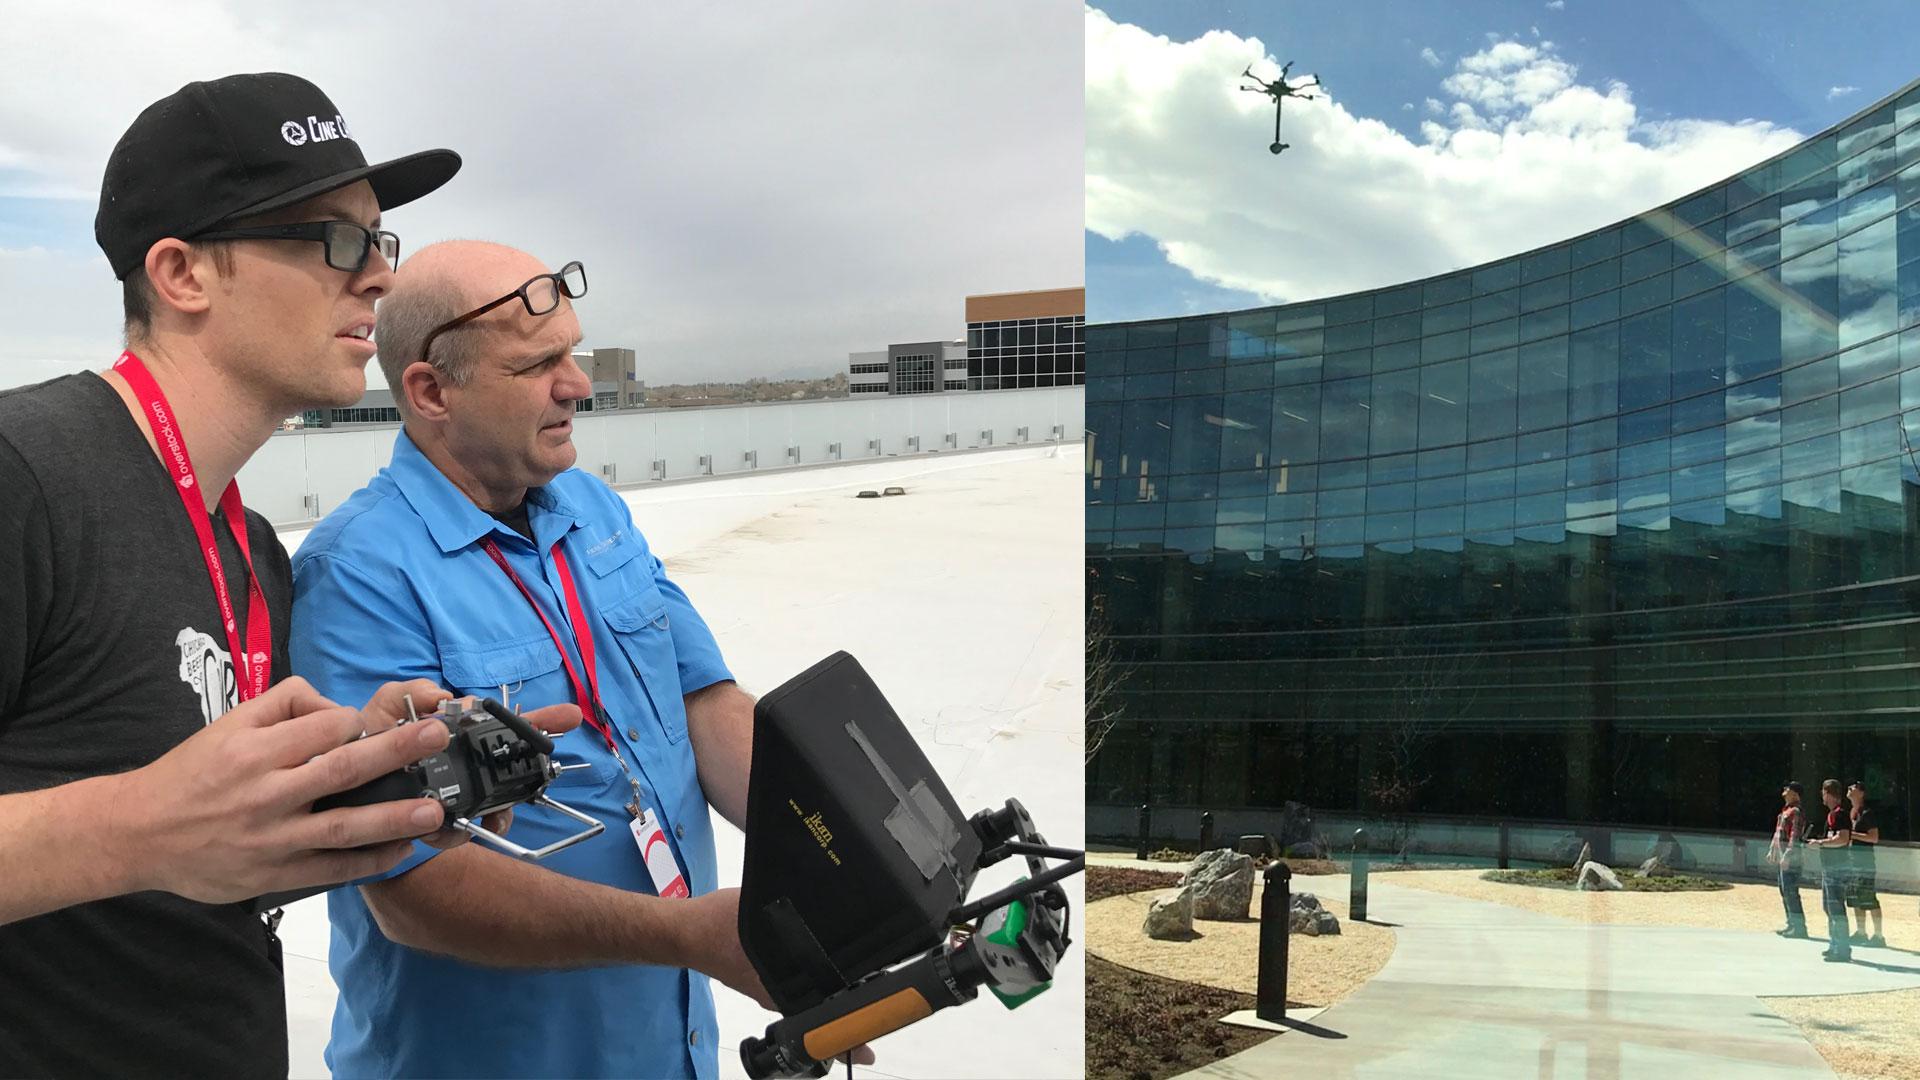 Ariel Drone Shot VR